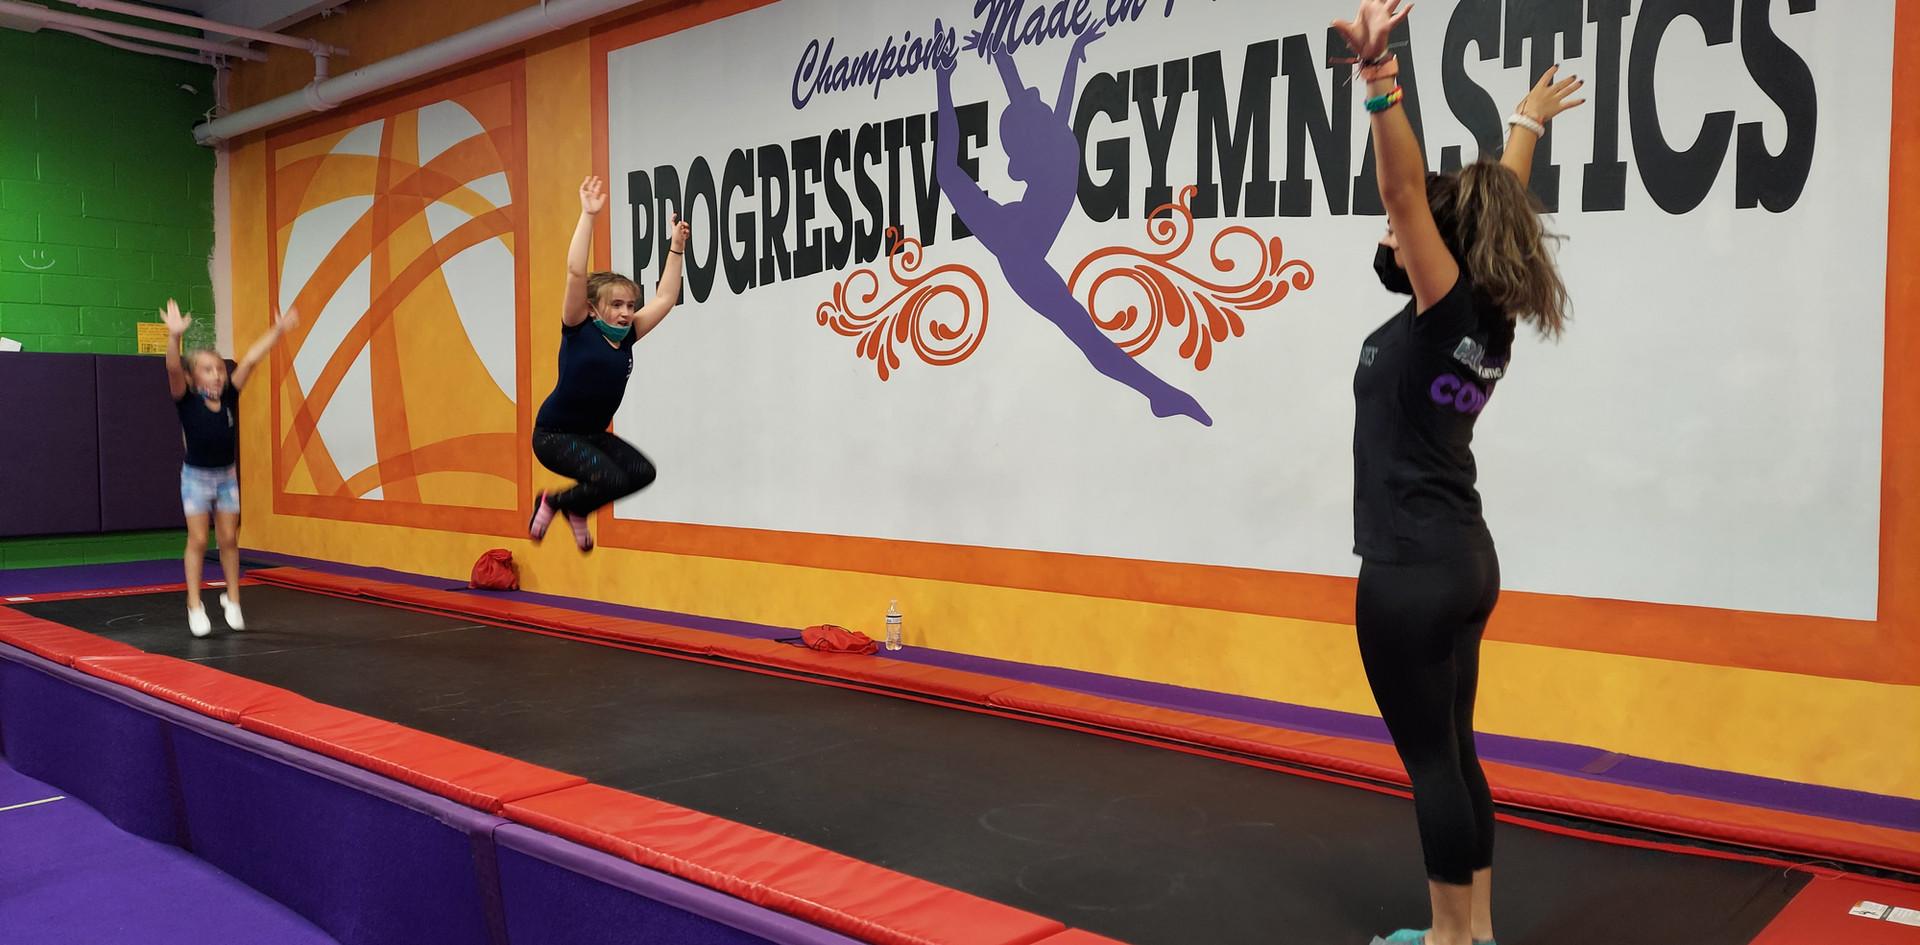 Gymnastics Tumble Track Fun